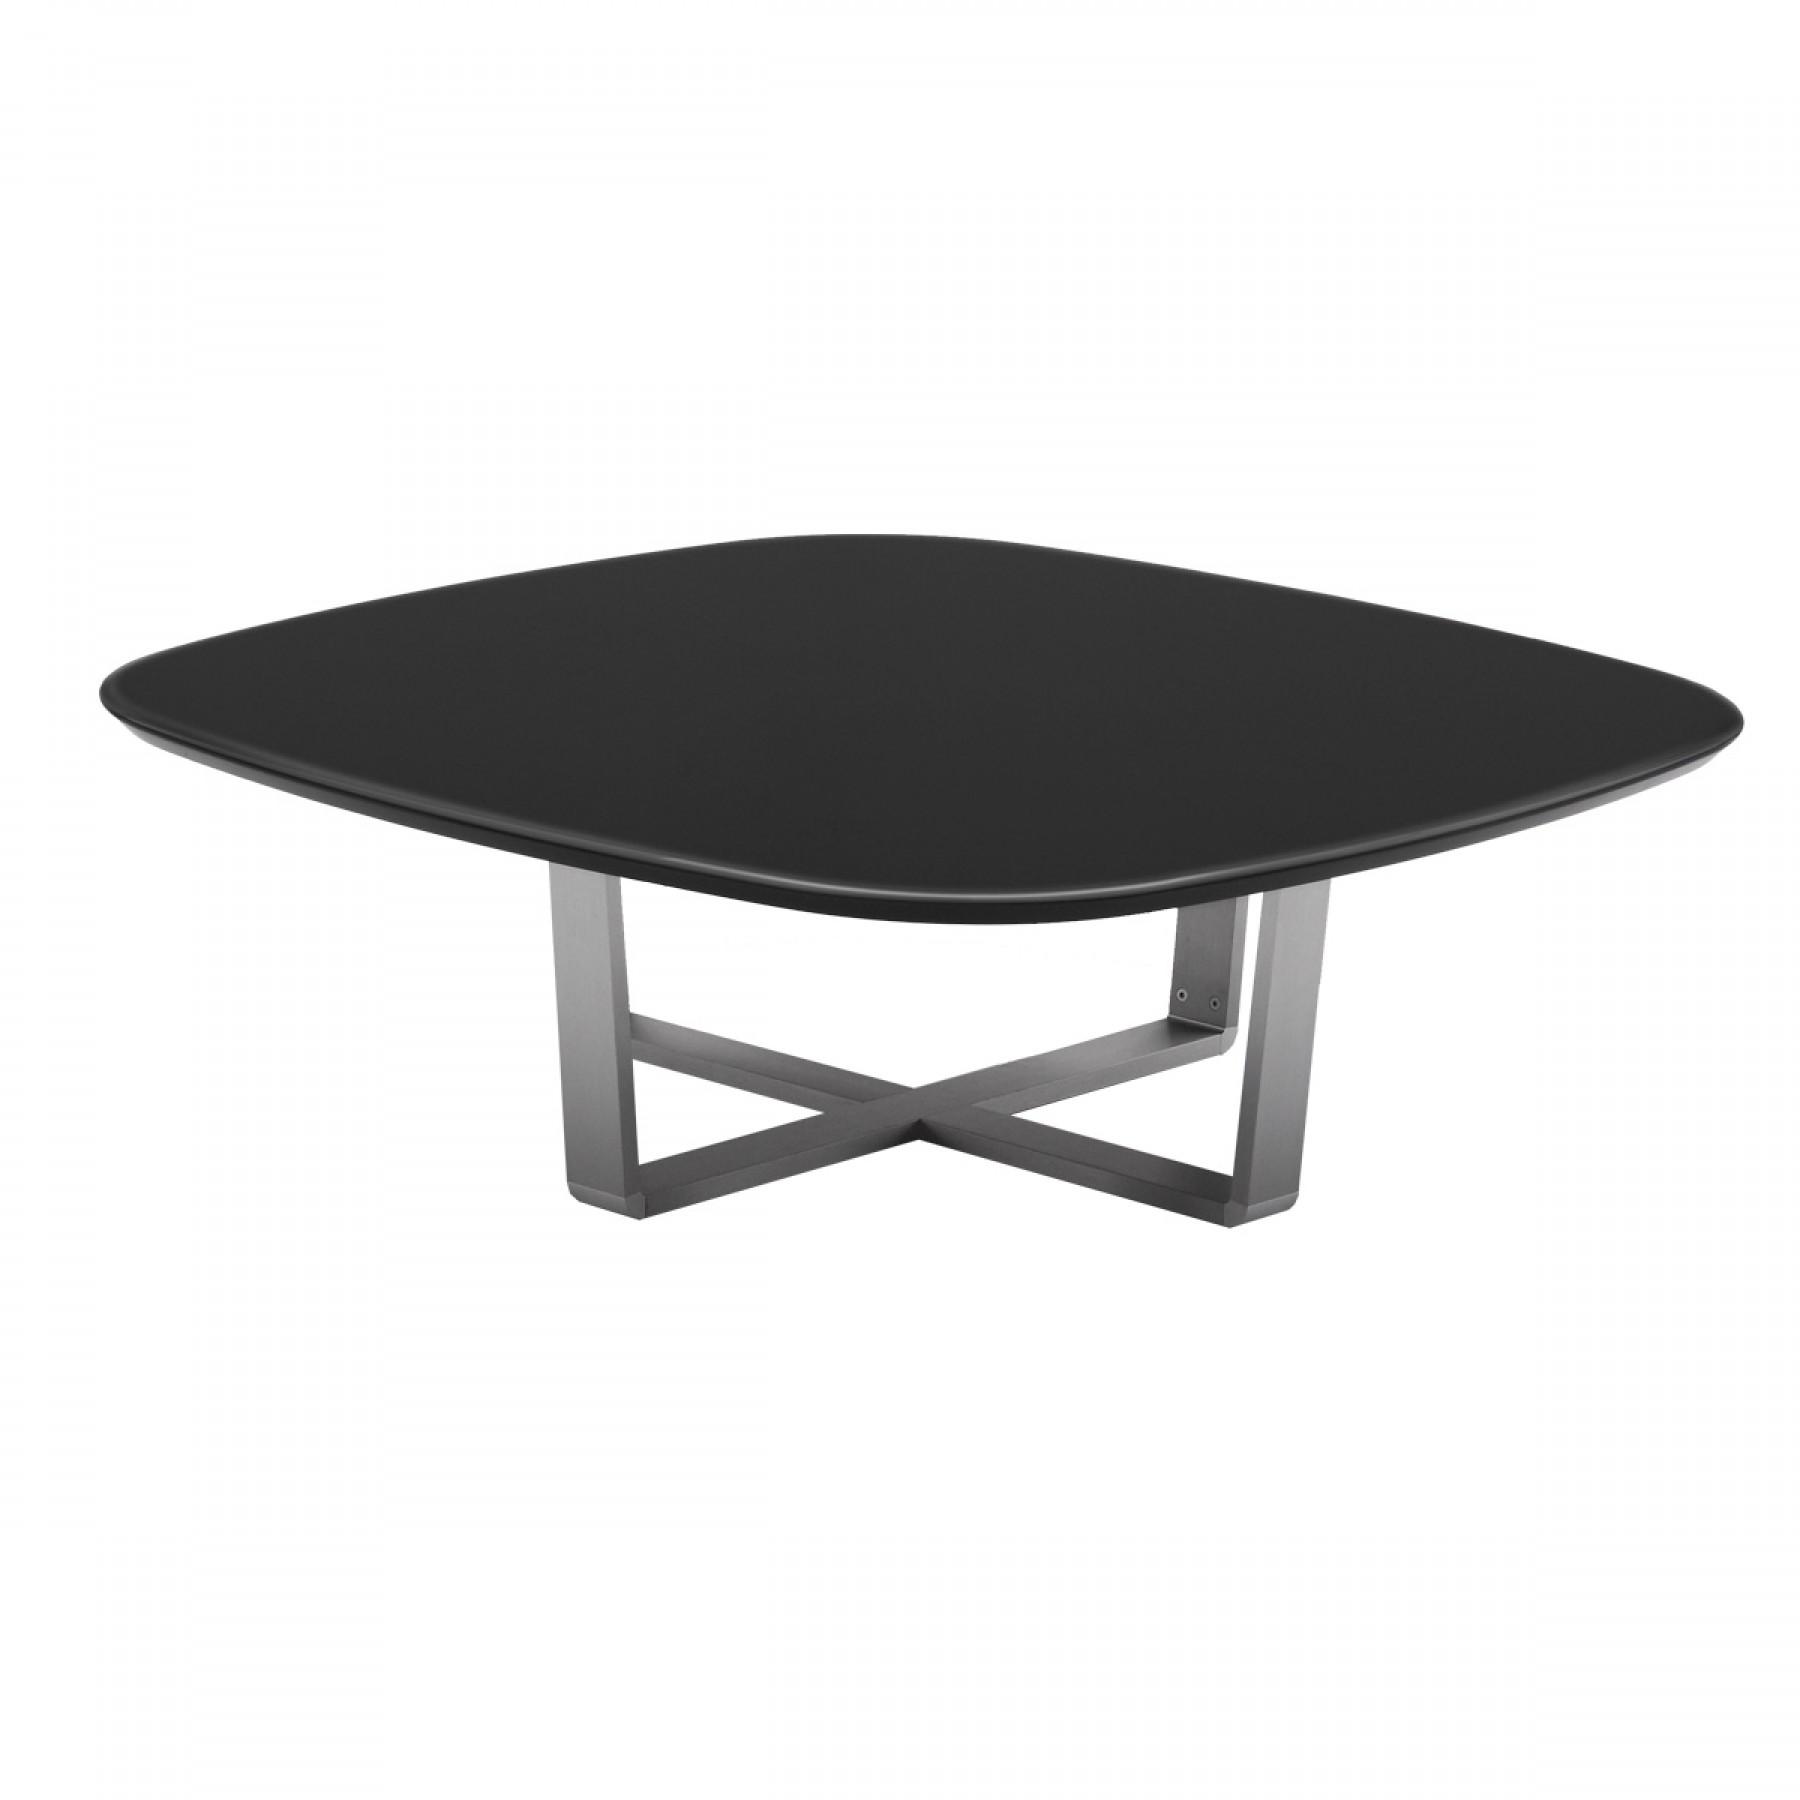 CINTURA SQUARE COFFEE TABLE Beyond Furniture : cintura square 1 1800x1800 from www.beyondfurniture.com.au size 1800 x 1800 jpeg 114kB